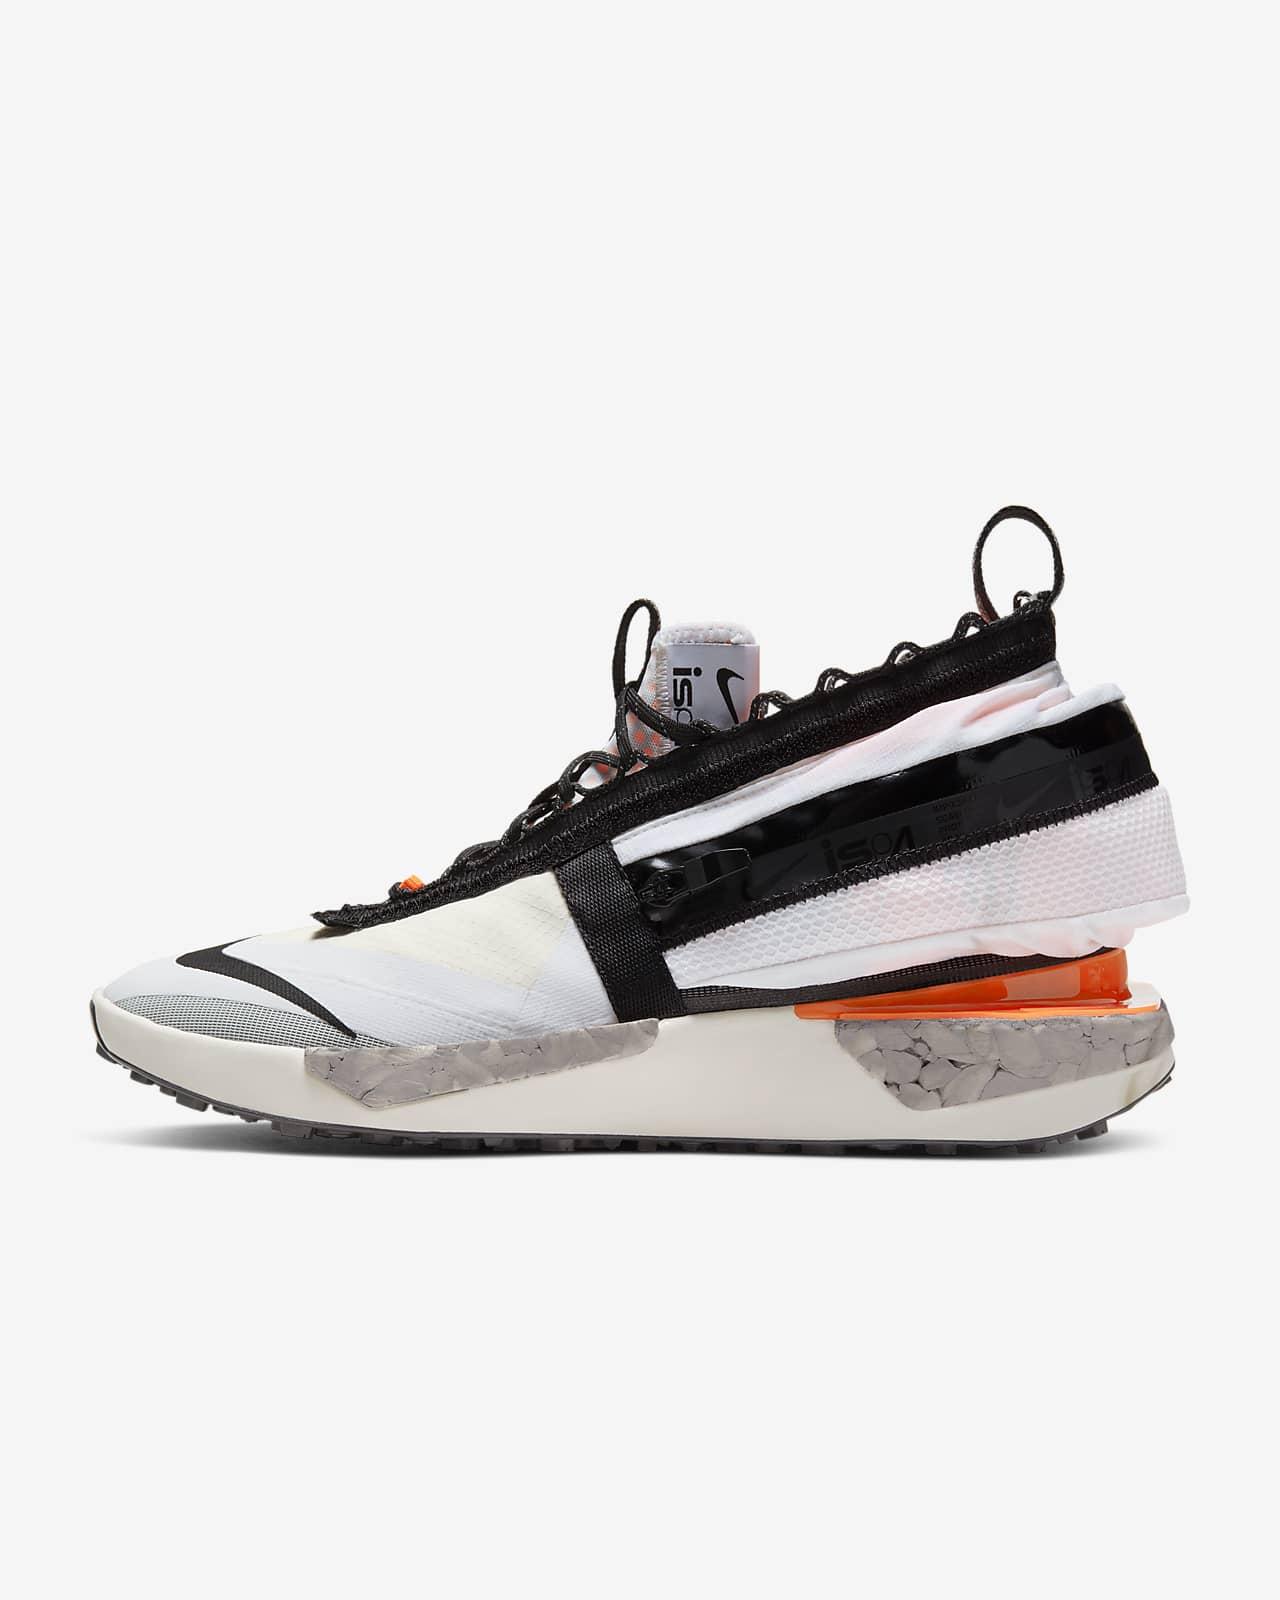 Nike ISPA Drifter Gator-sko